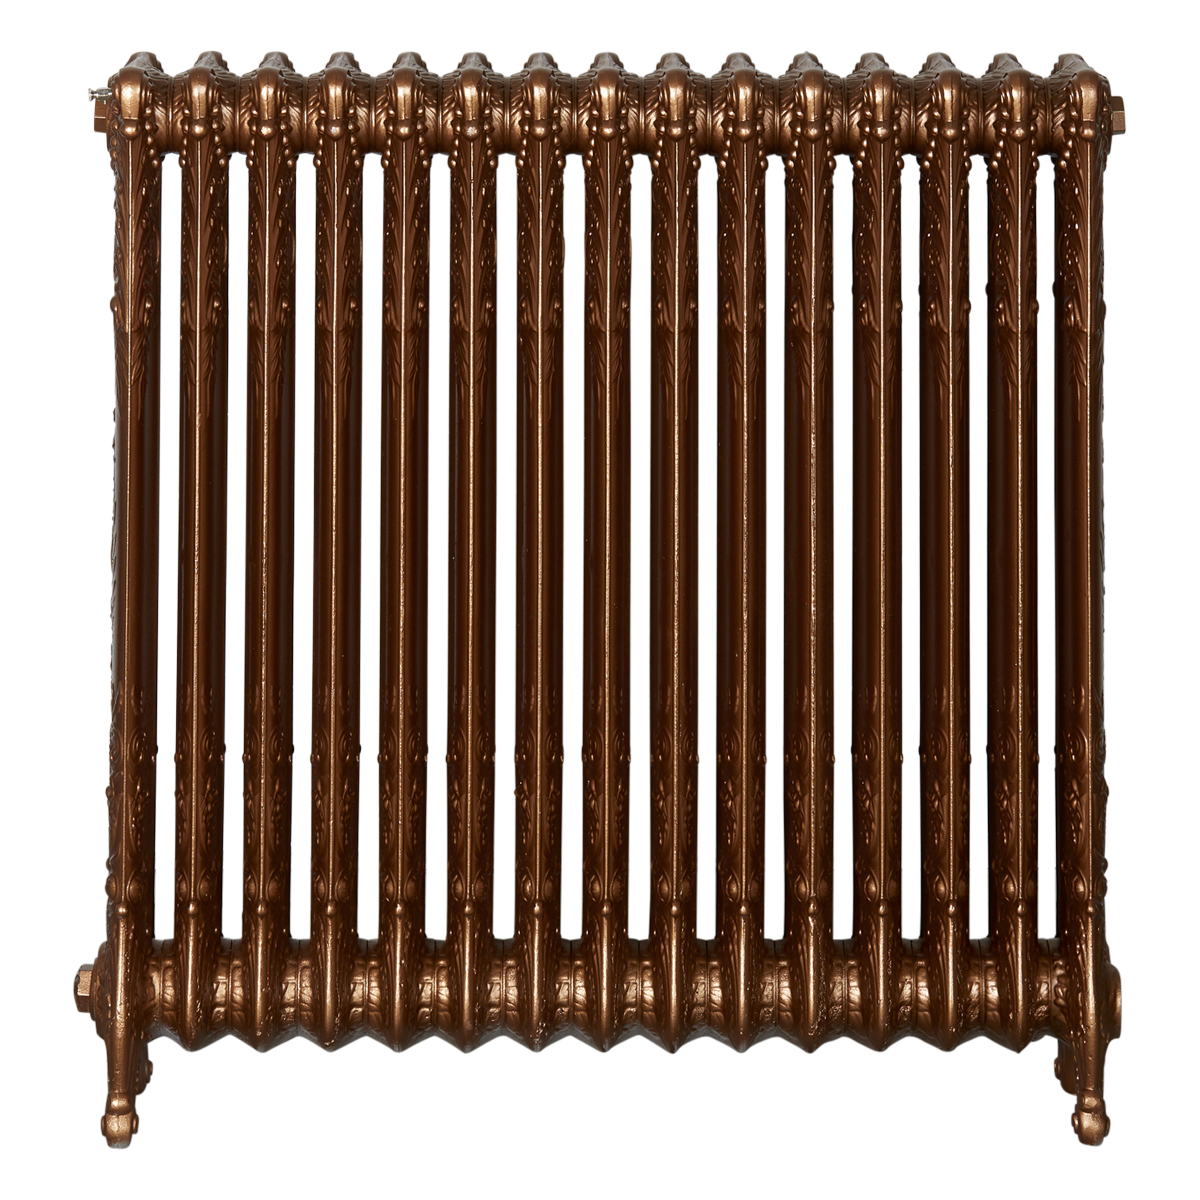 Ironworks Radiators Inc. refurbished cast iron radiator Rosethorn in Antique Bronze metallic